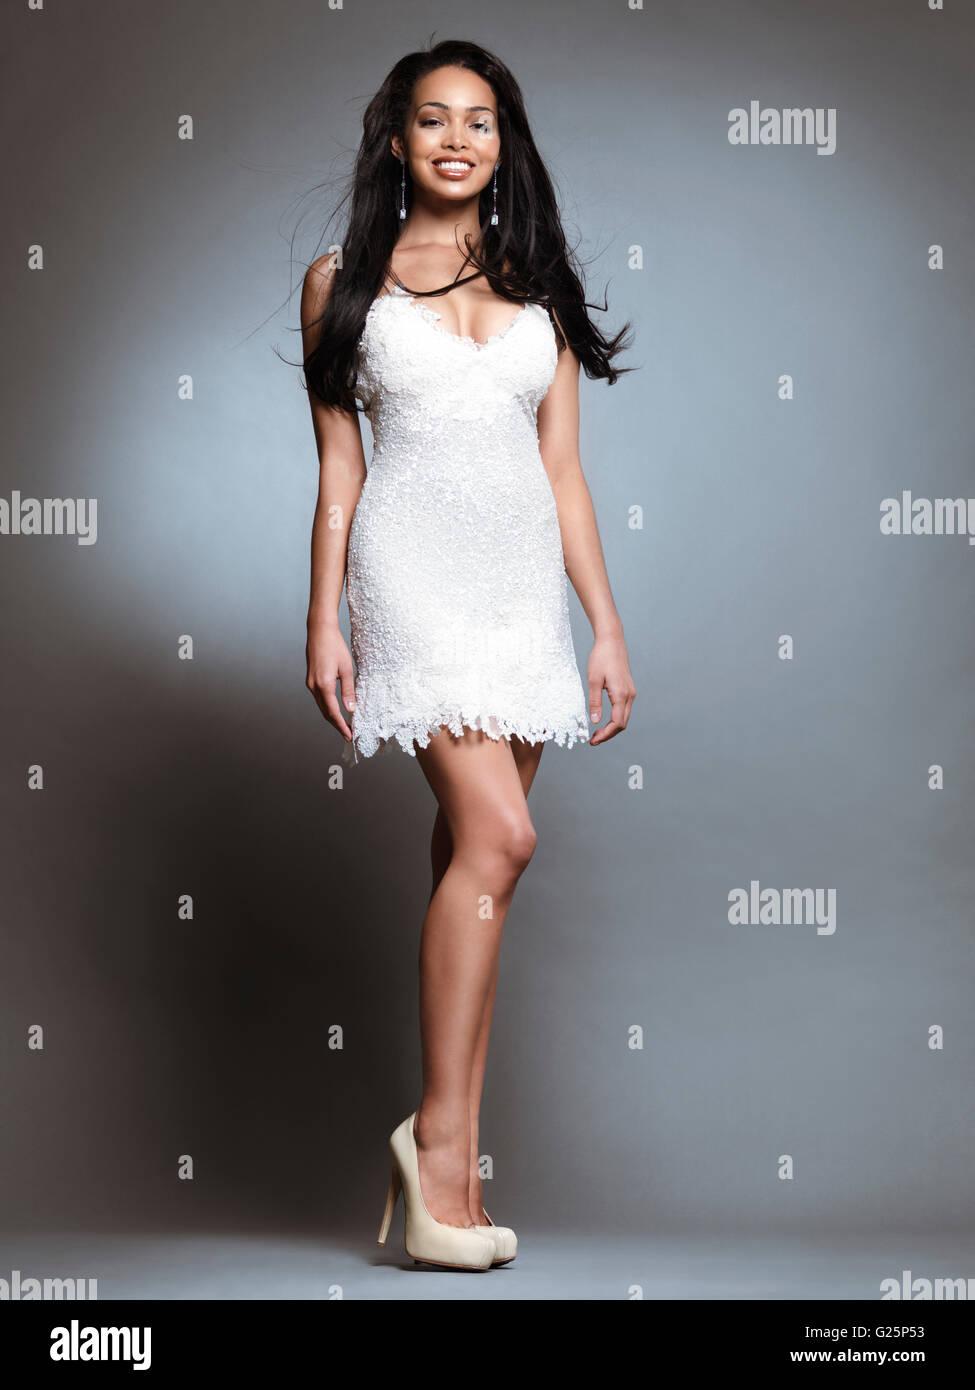 Black And White Mini Dress Stockfotos & Black And White Mini Dress ...